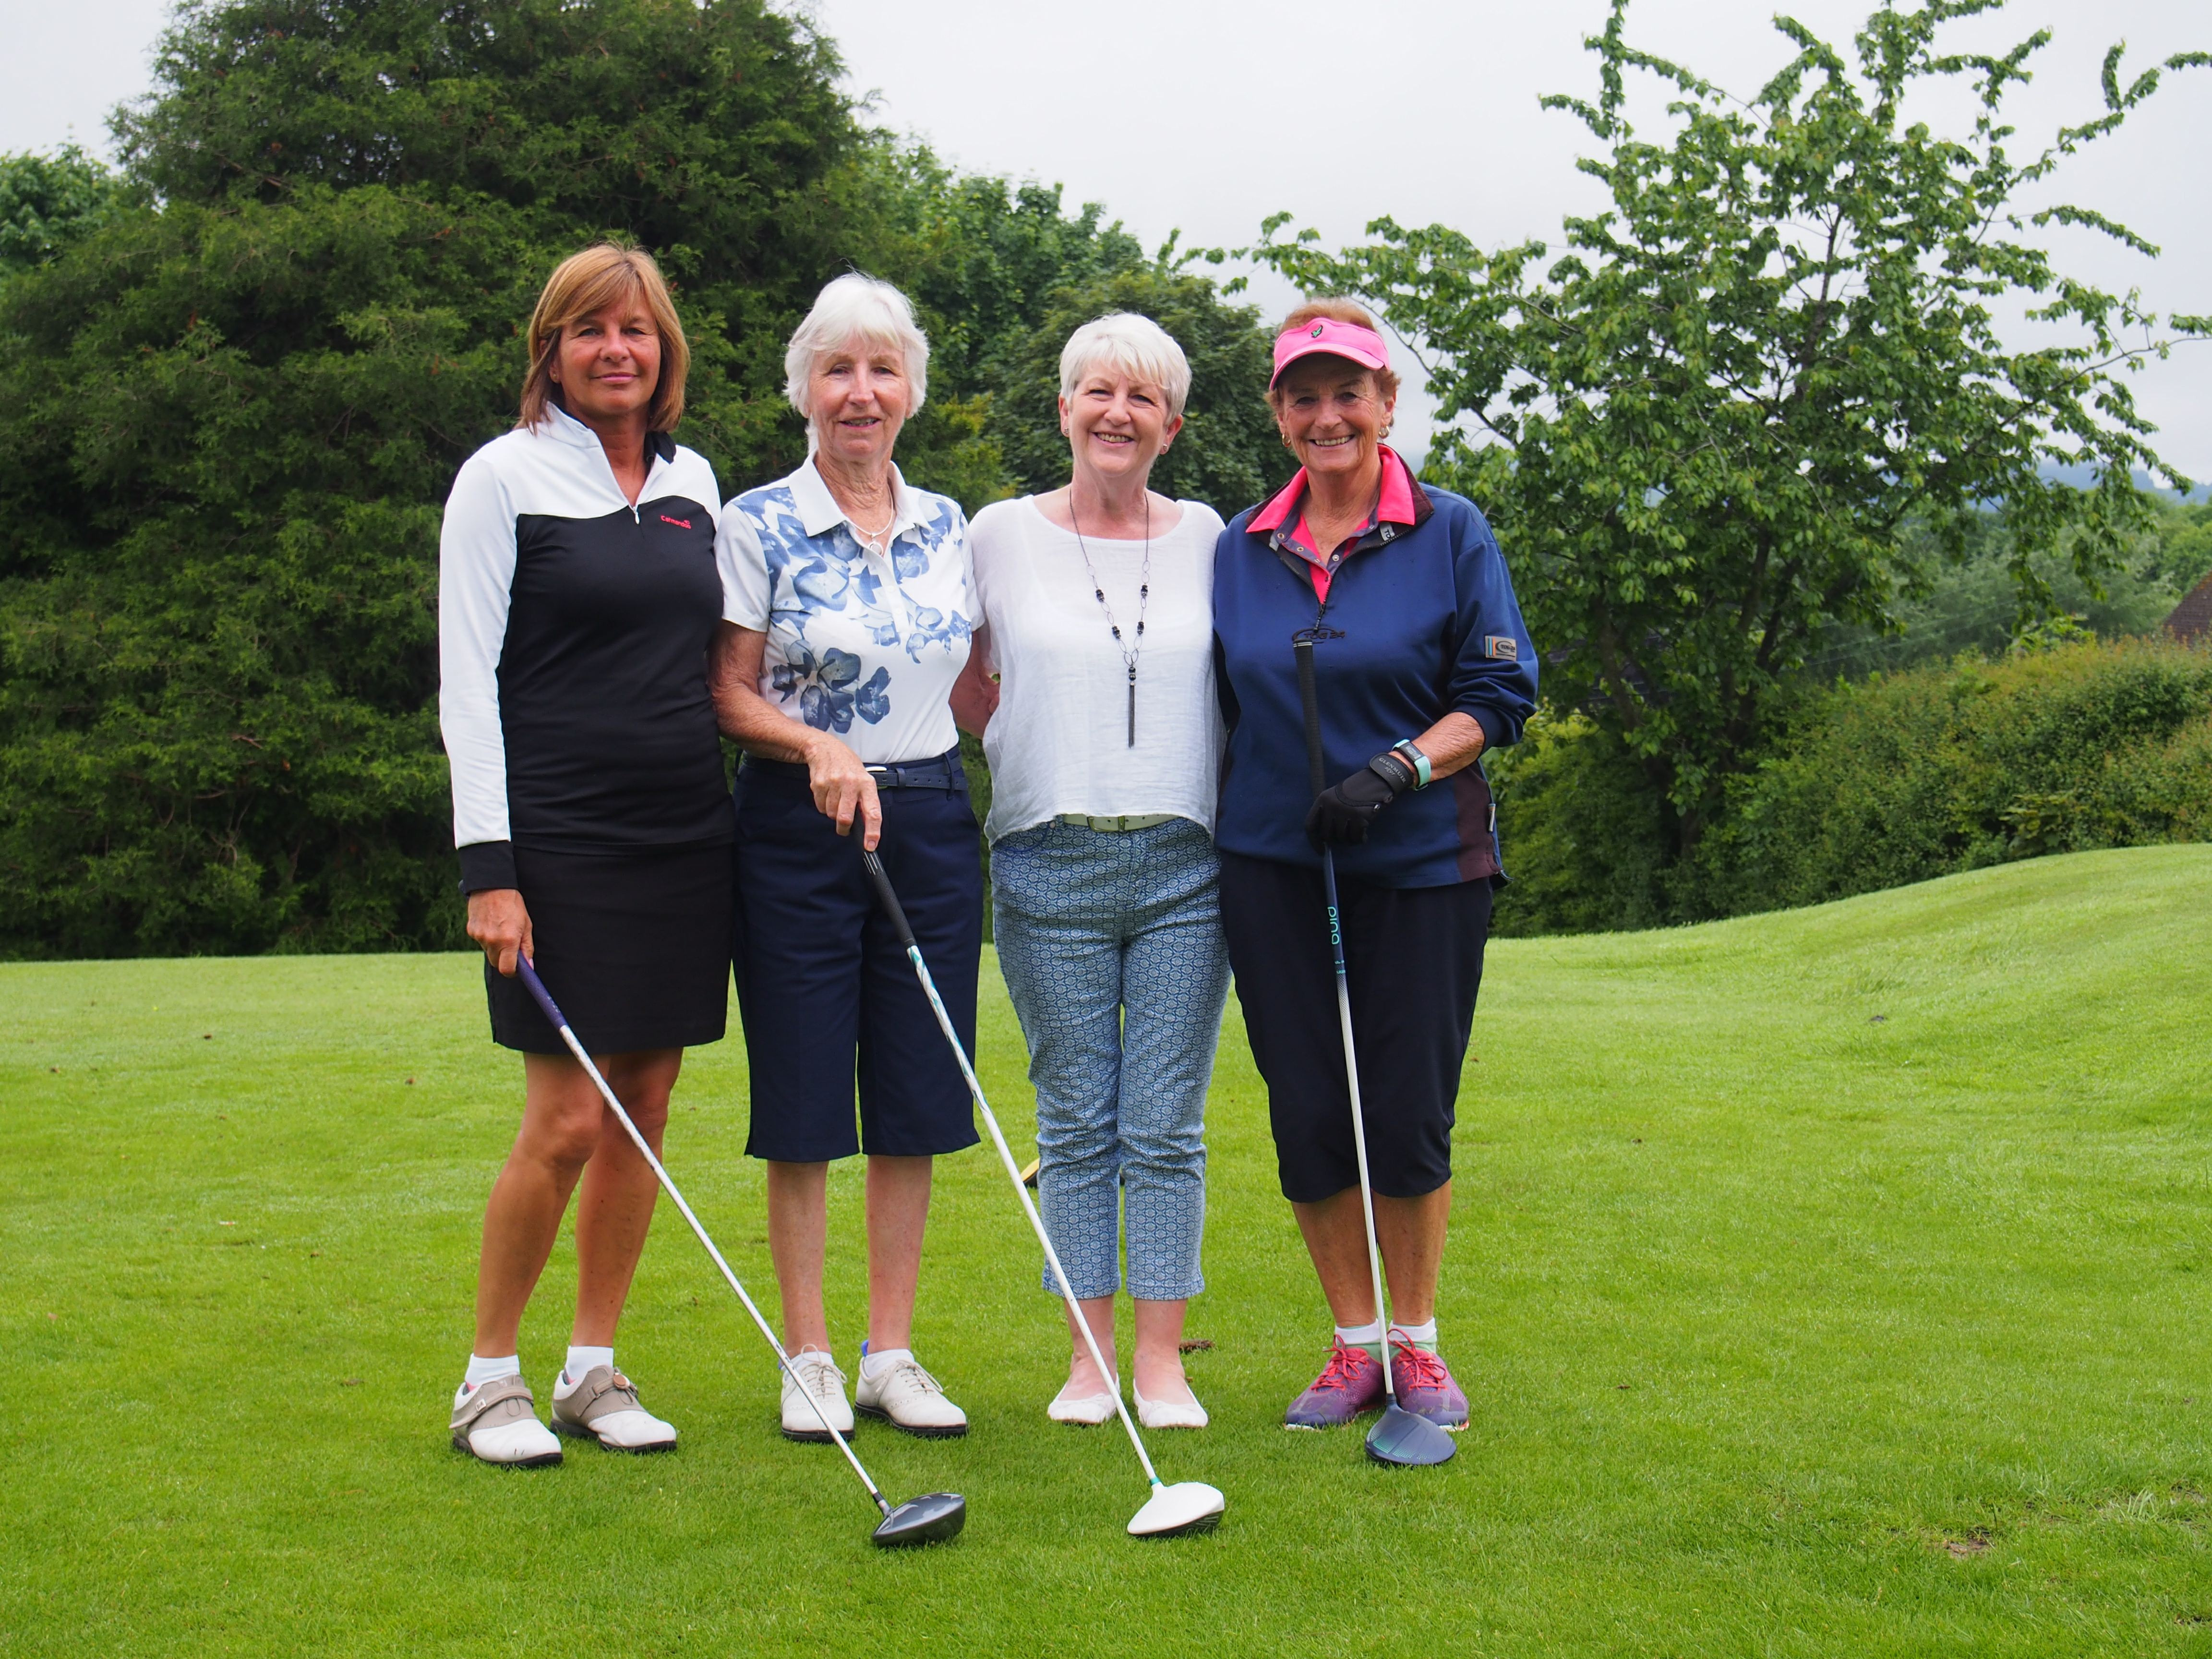 Ladies Golf at Mold Golf Club